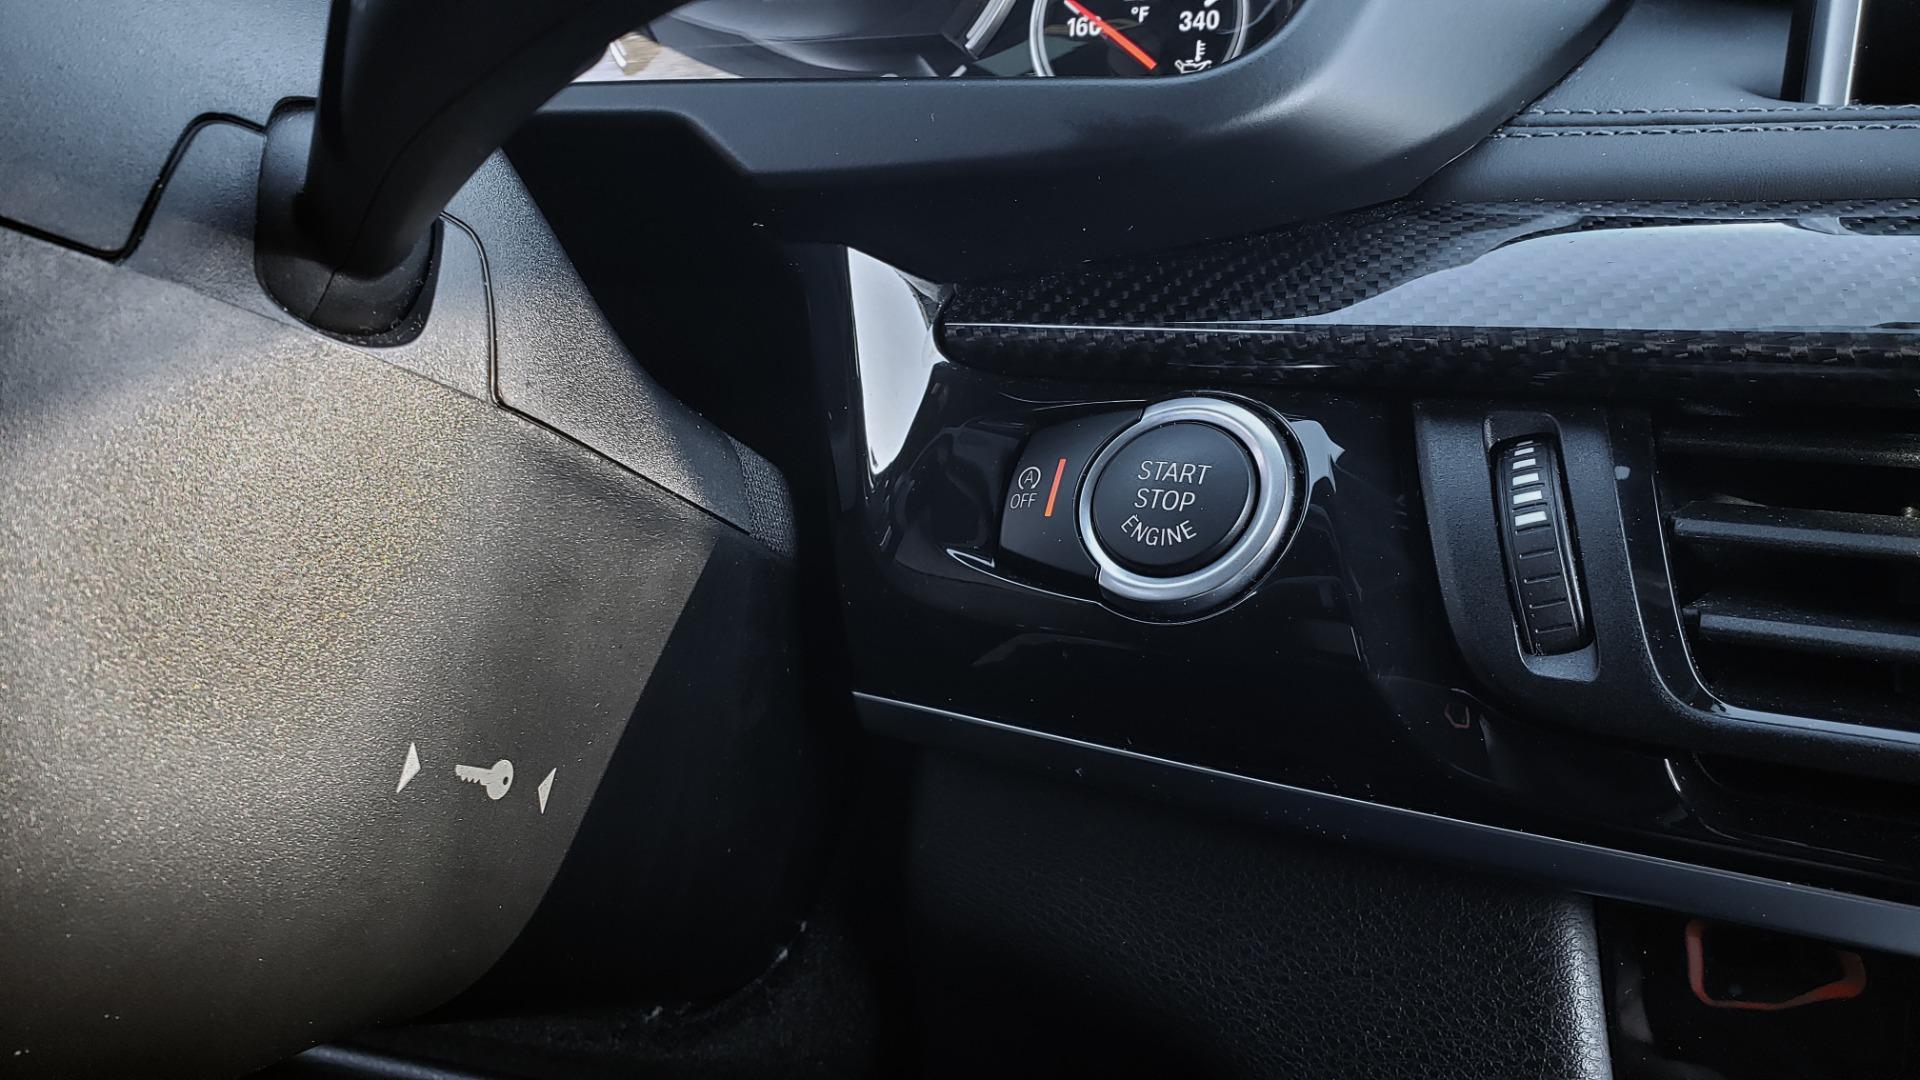 Used 2016 BMW X6 M EXEC PKG / DRVR ASST / NAV / SUNROOF / BLIND SPOT / REARVIEW for sale Sold at Formula Imports in Charlotte NC 28227 51